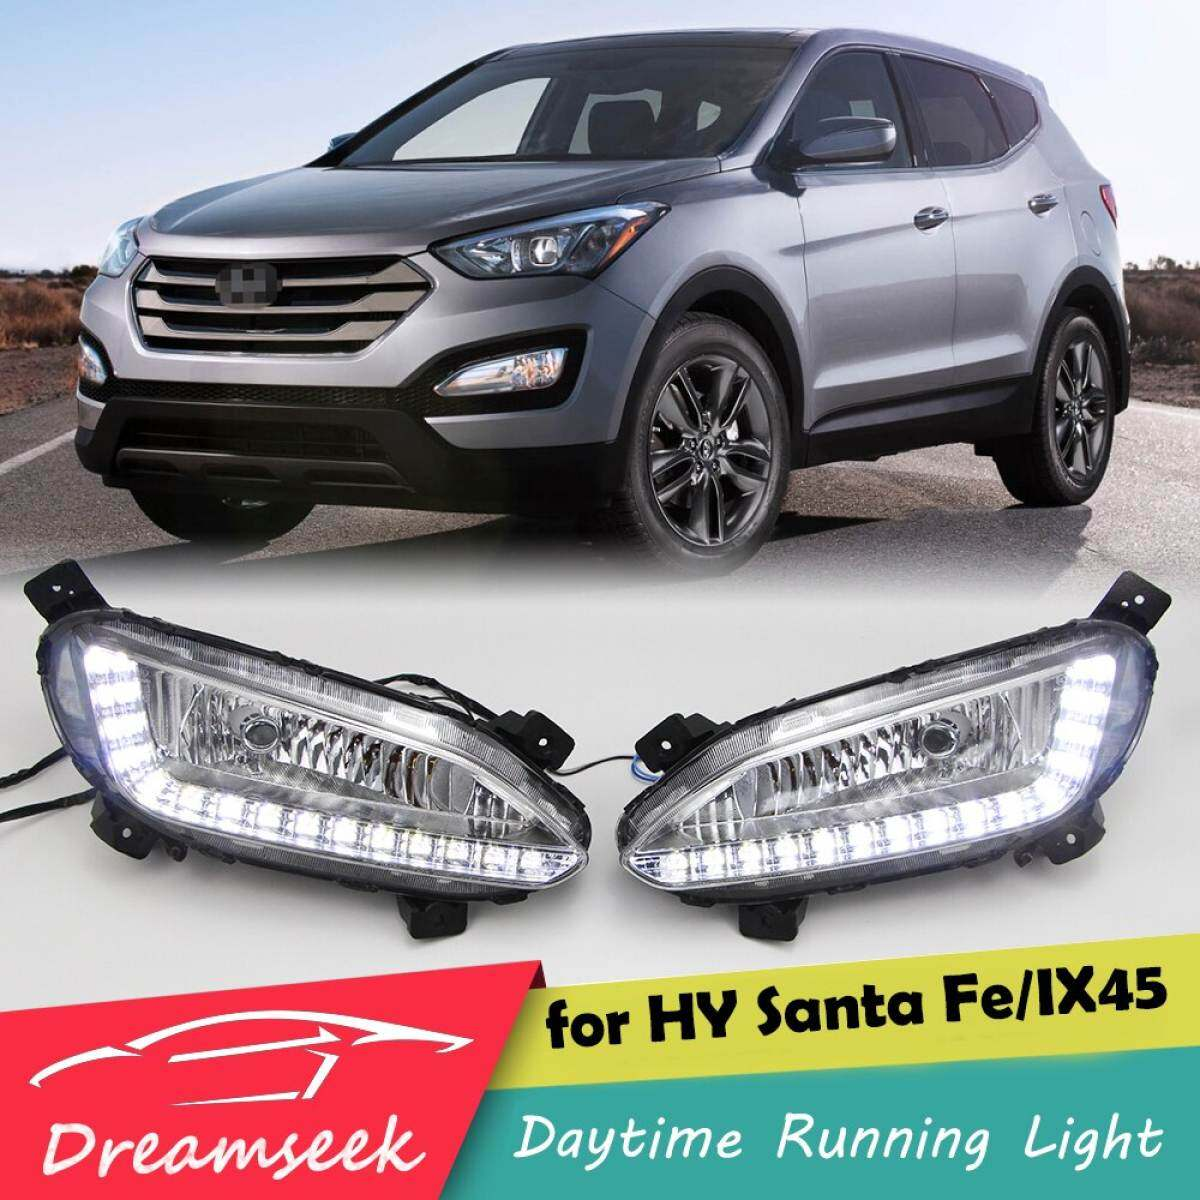 Led Drl For Hyundai Santa Fe Ix45 2013 2014 2015 Daytime Running Light Fog Lamp Single Hole Lazada